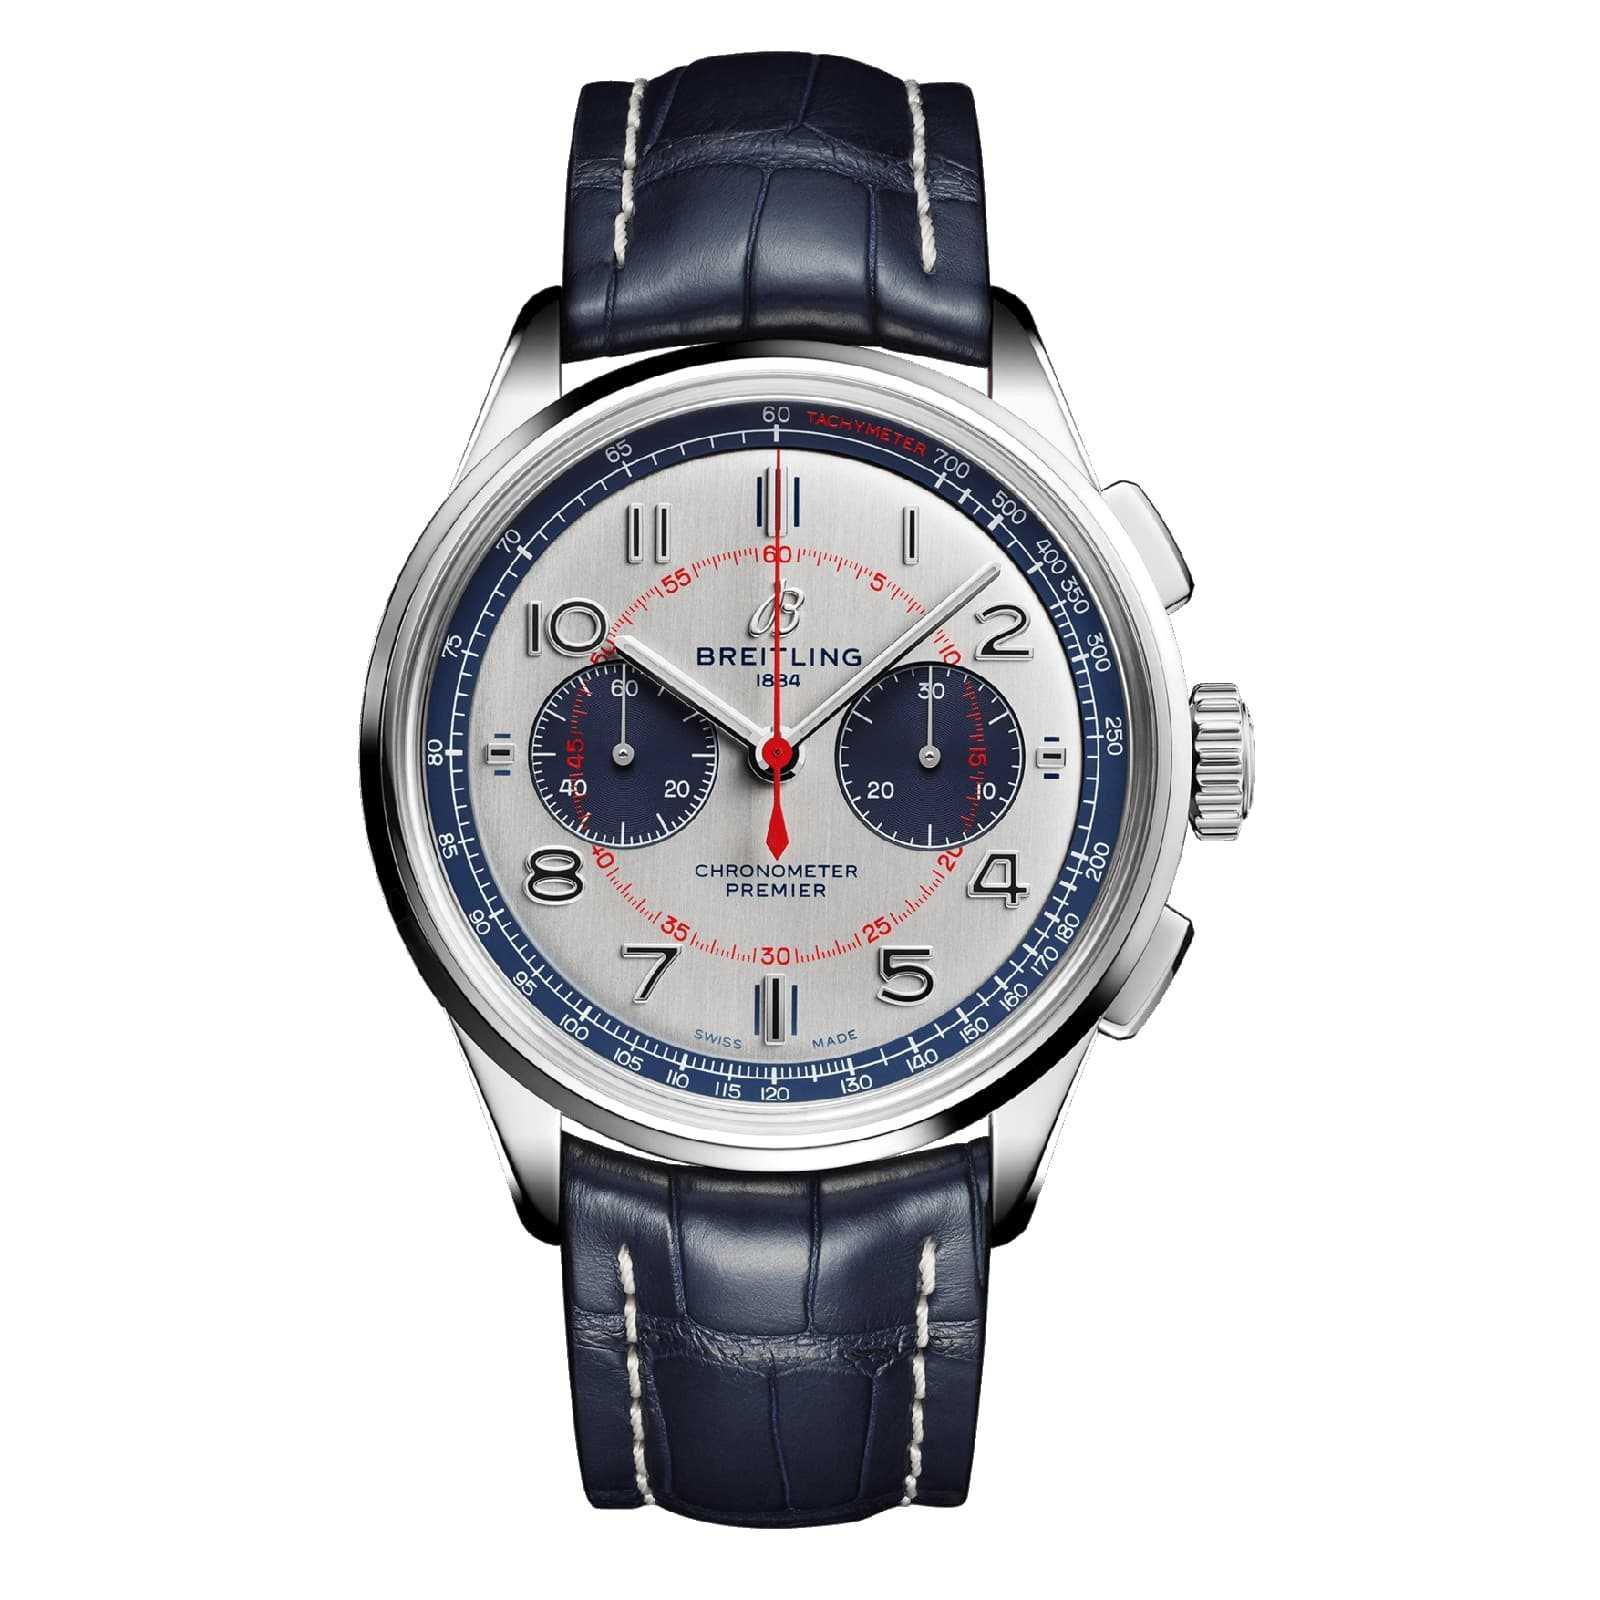 Breitling Premier B01 Chronograph 42 Bentley Mulliner Limited Edition Watch